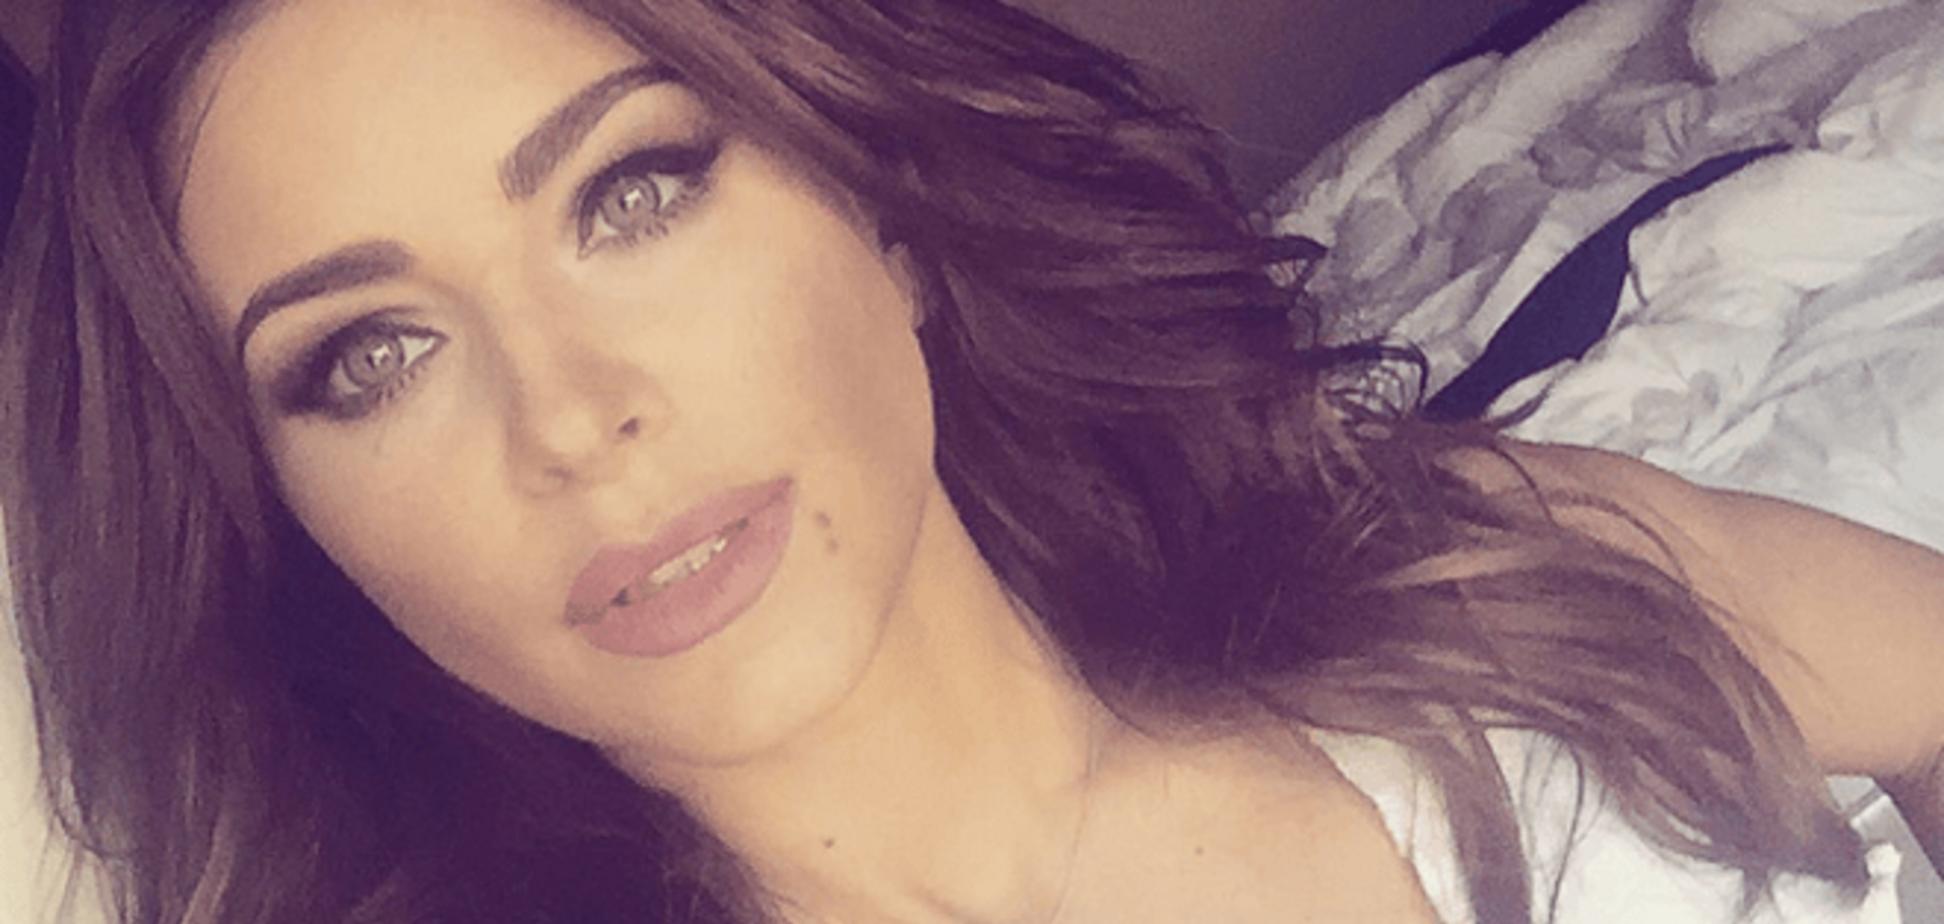 Ани Лорак оторвалась на концерте Димы Билана